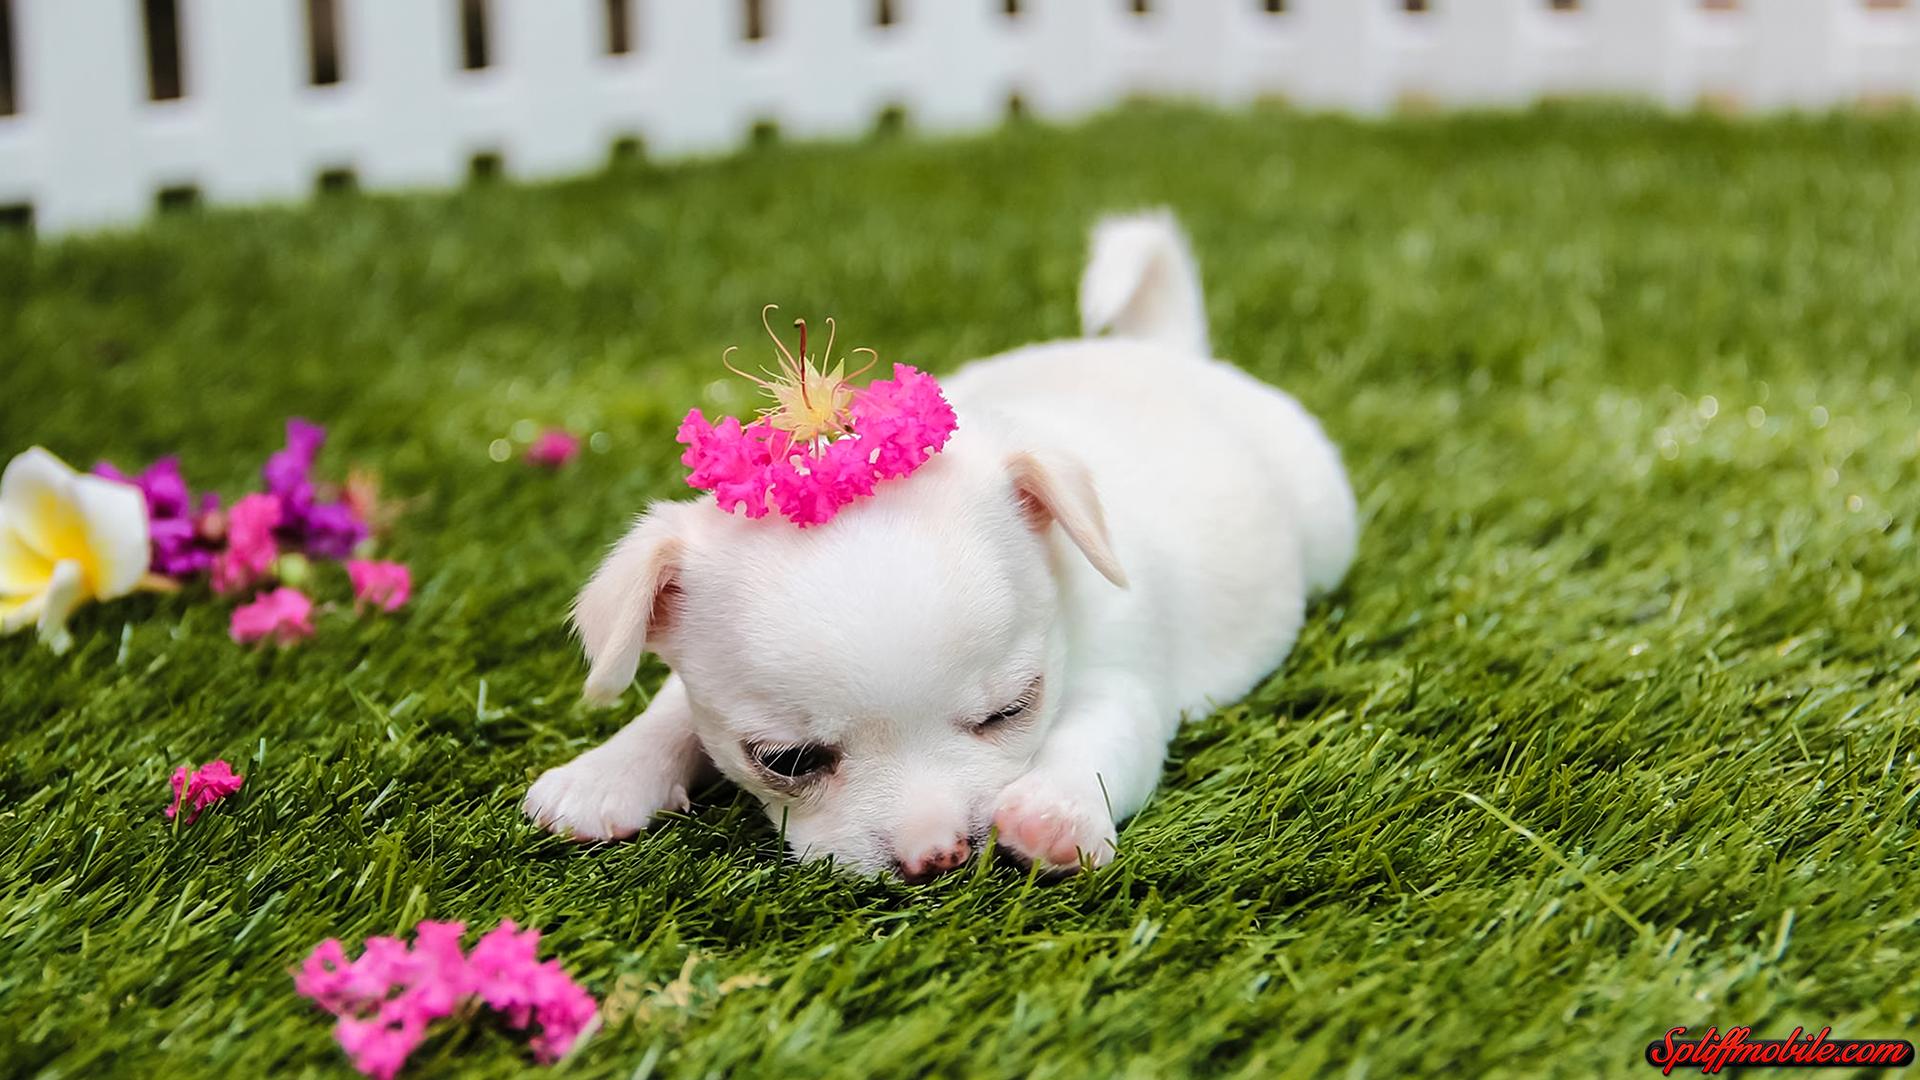 HD Cute Puppy Wallpaper 1920x1080